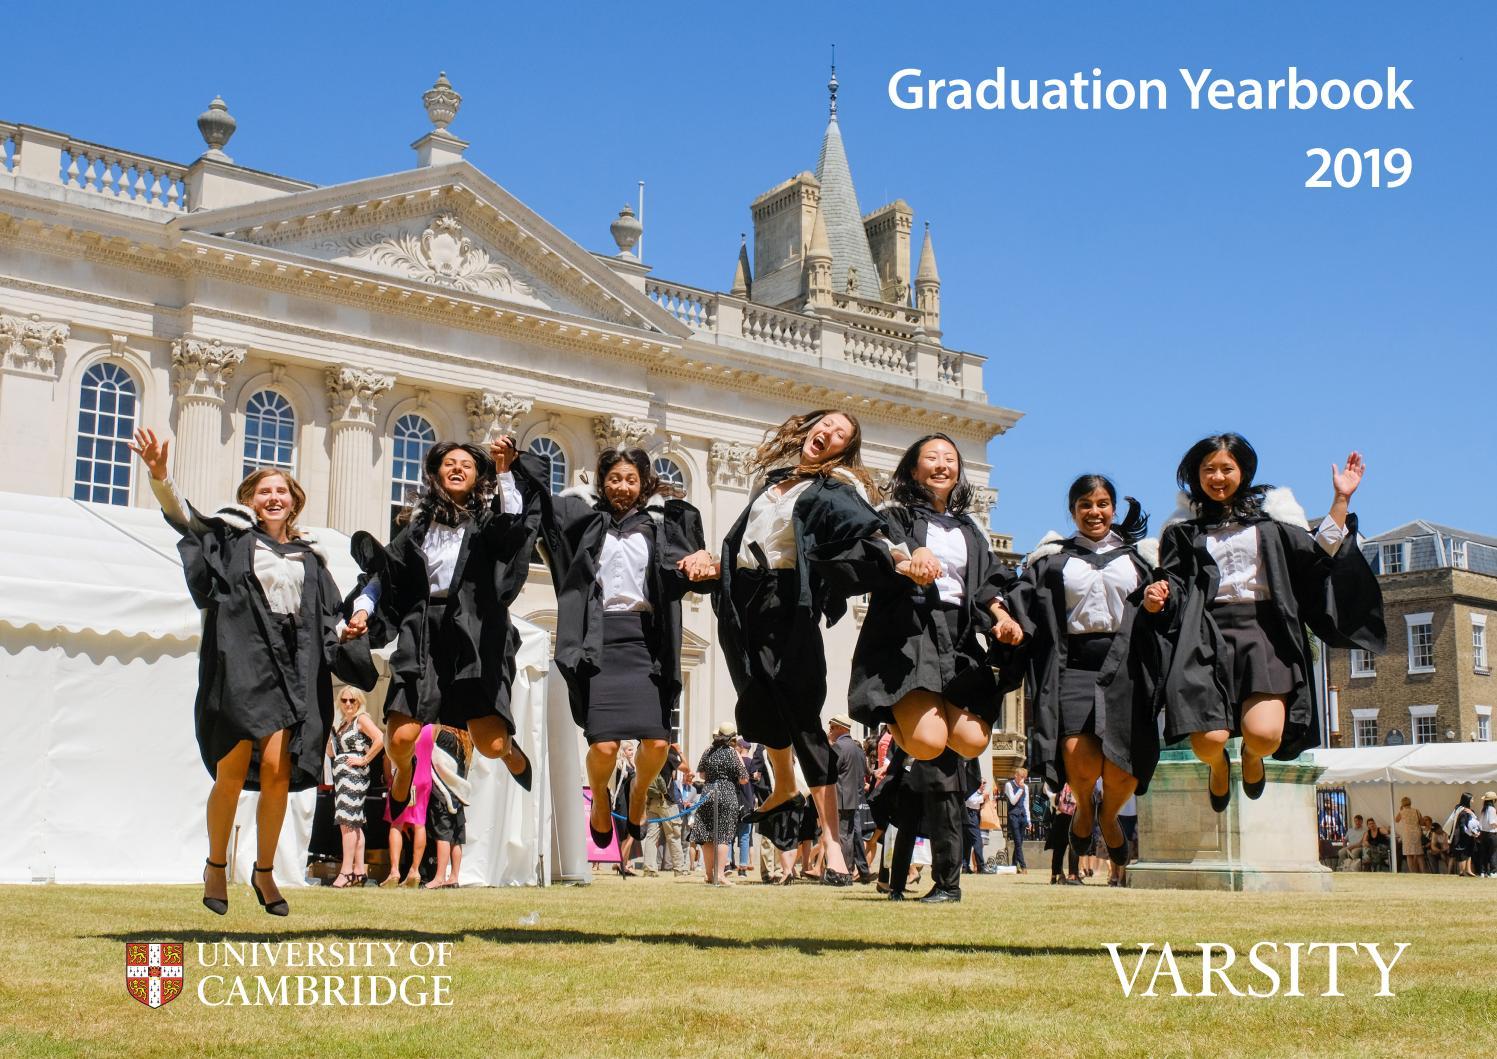 University of Cambridge Graduation Yearbook 2019 by